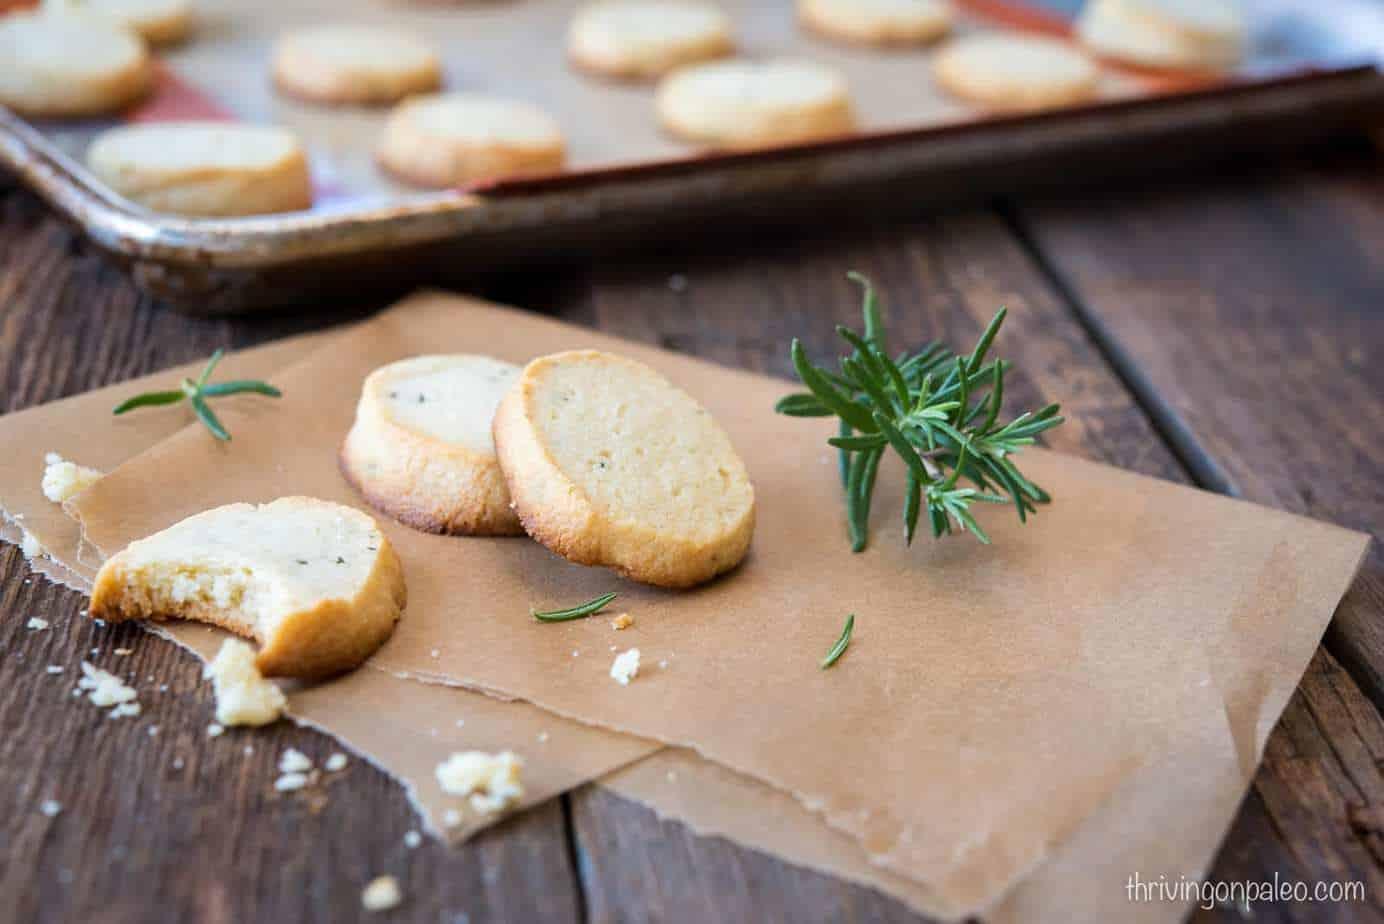 Paleo Rosemary Shortbread Cookies